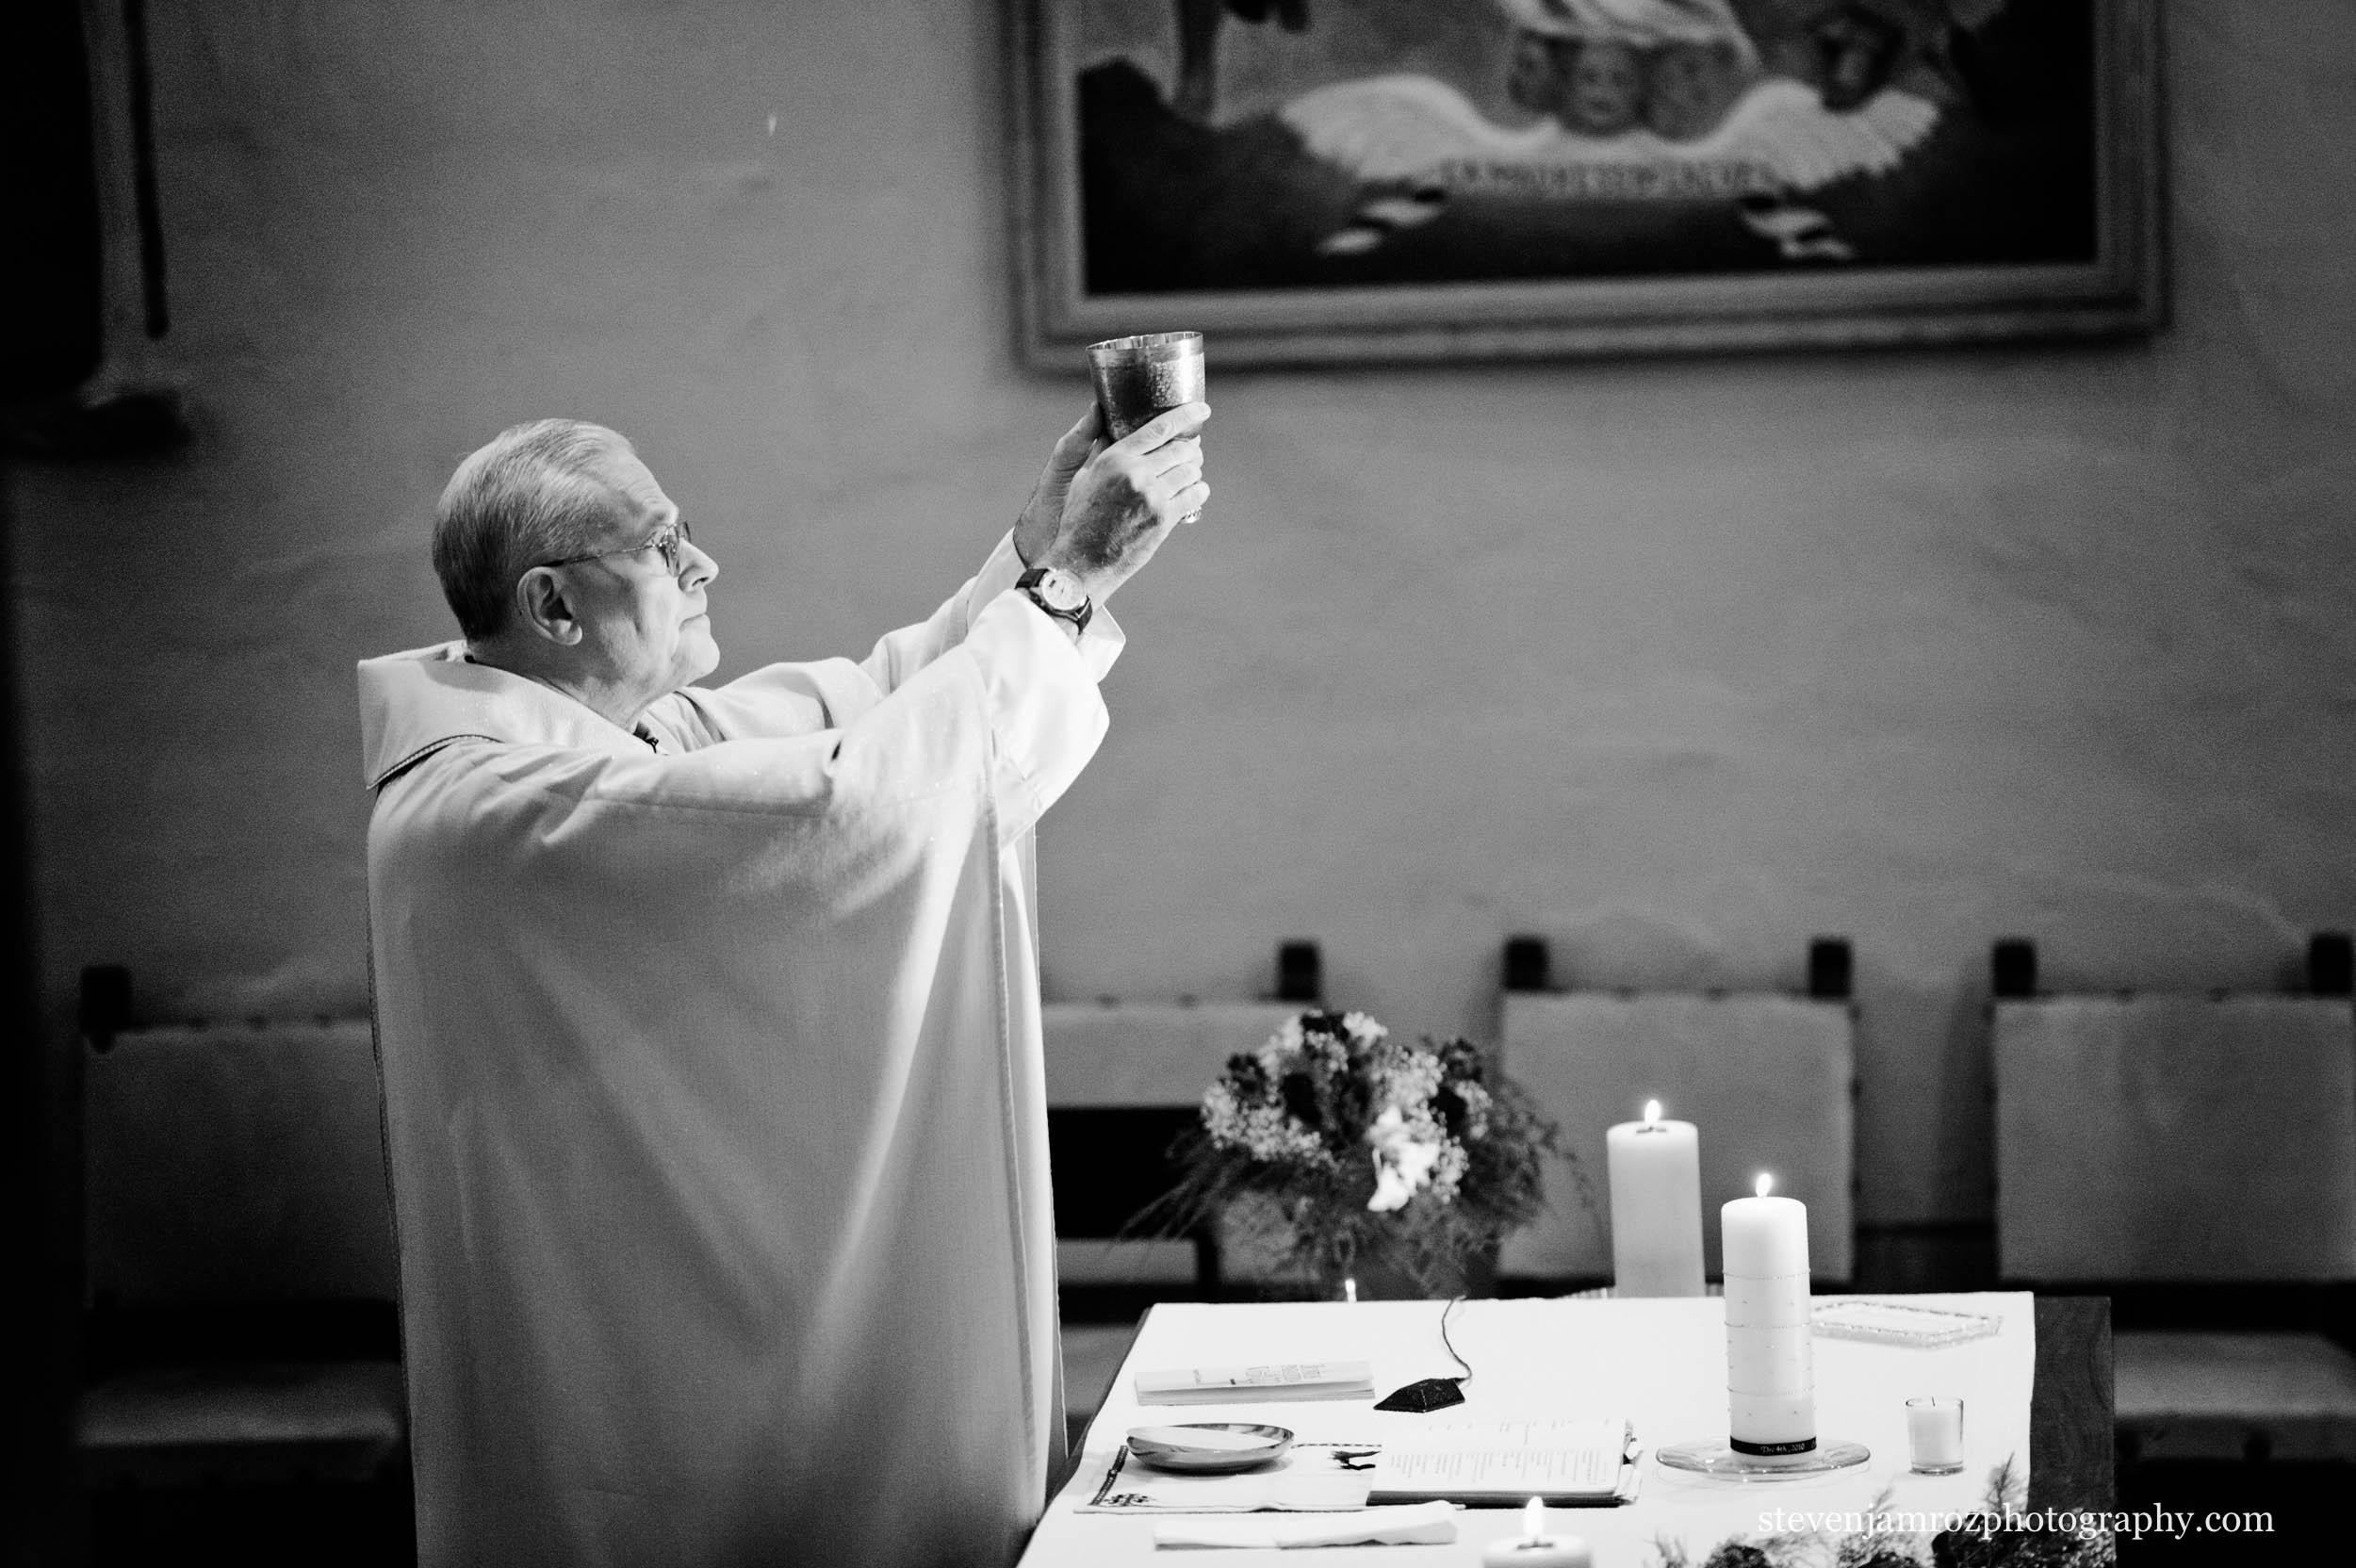 priest-holds-wine-durham-nc-wedding-steven-jamroz-photography-0444.jpg